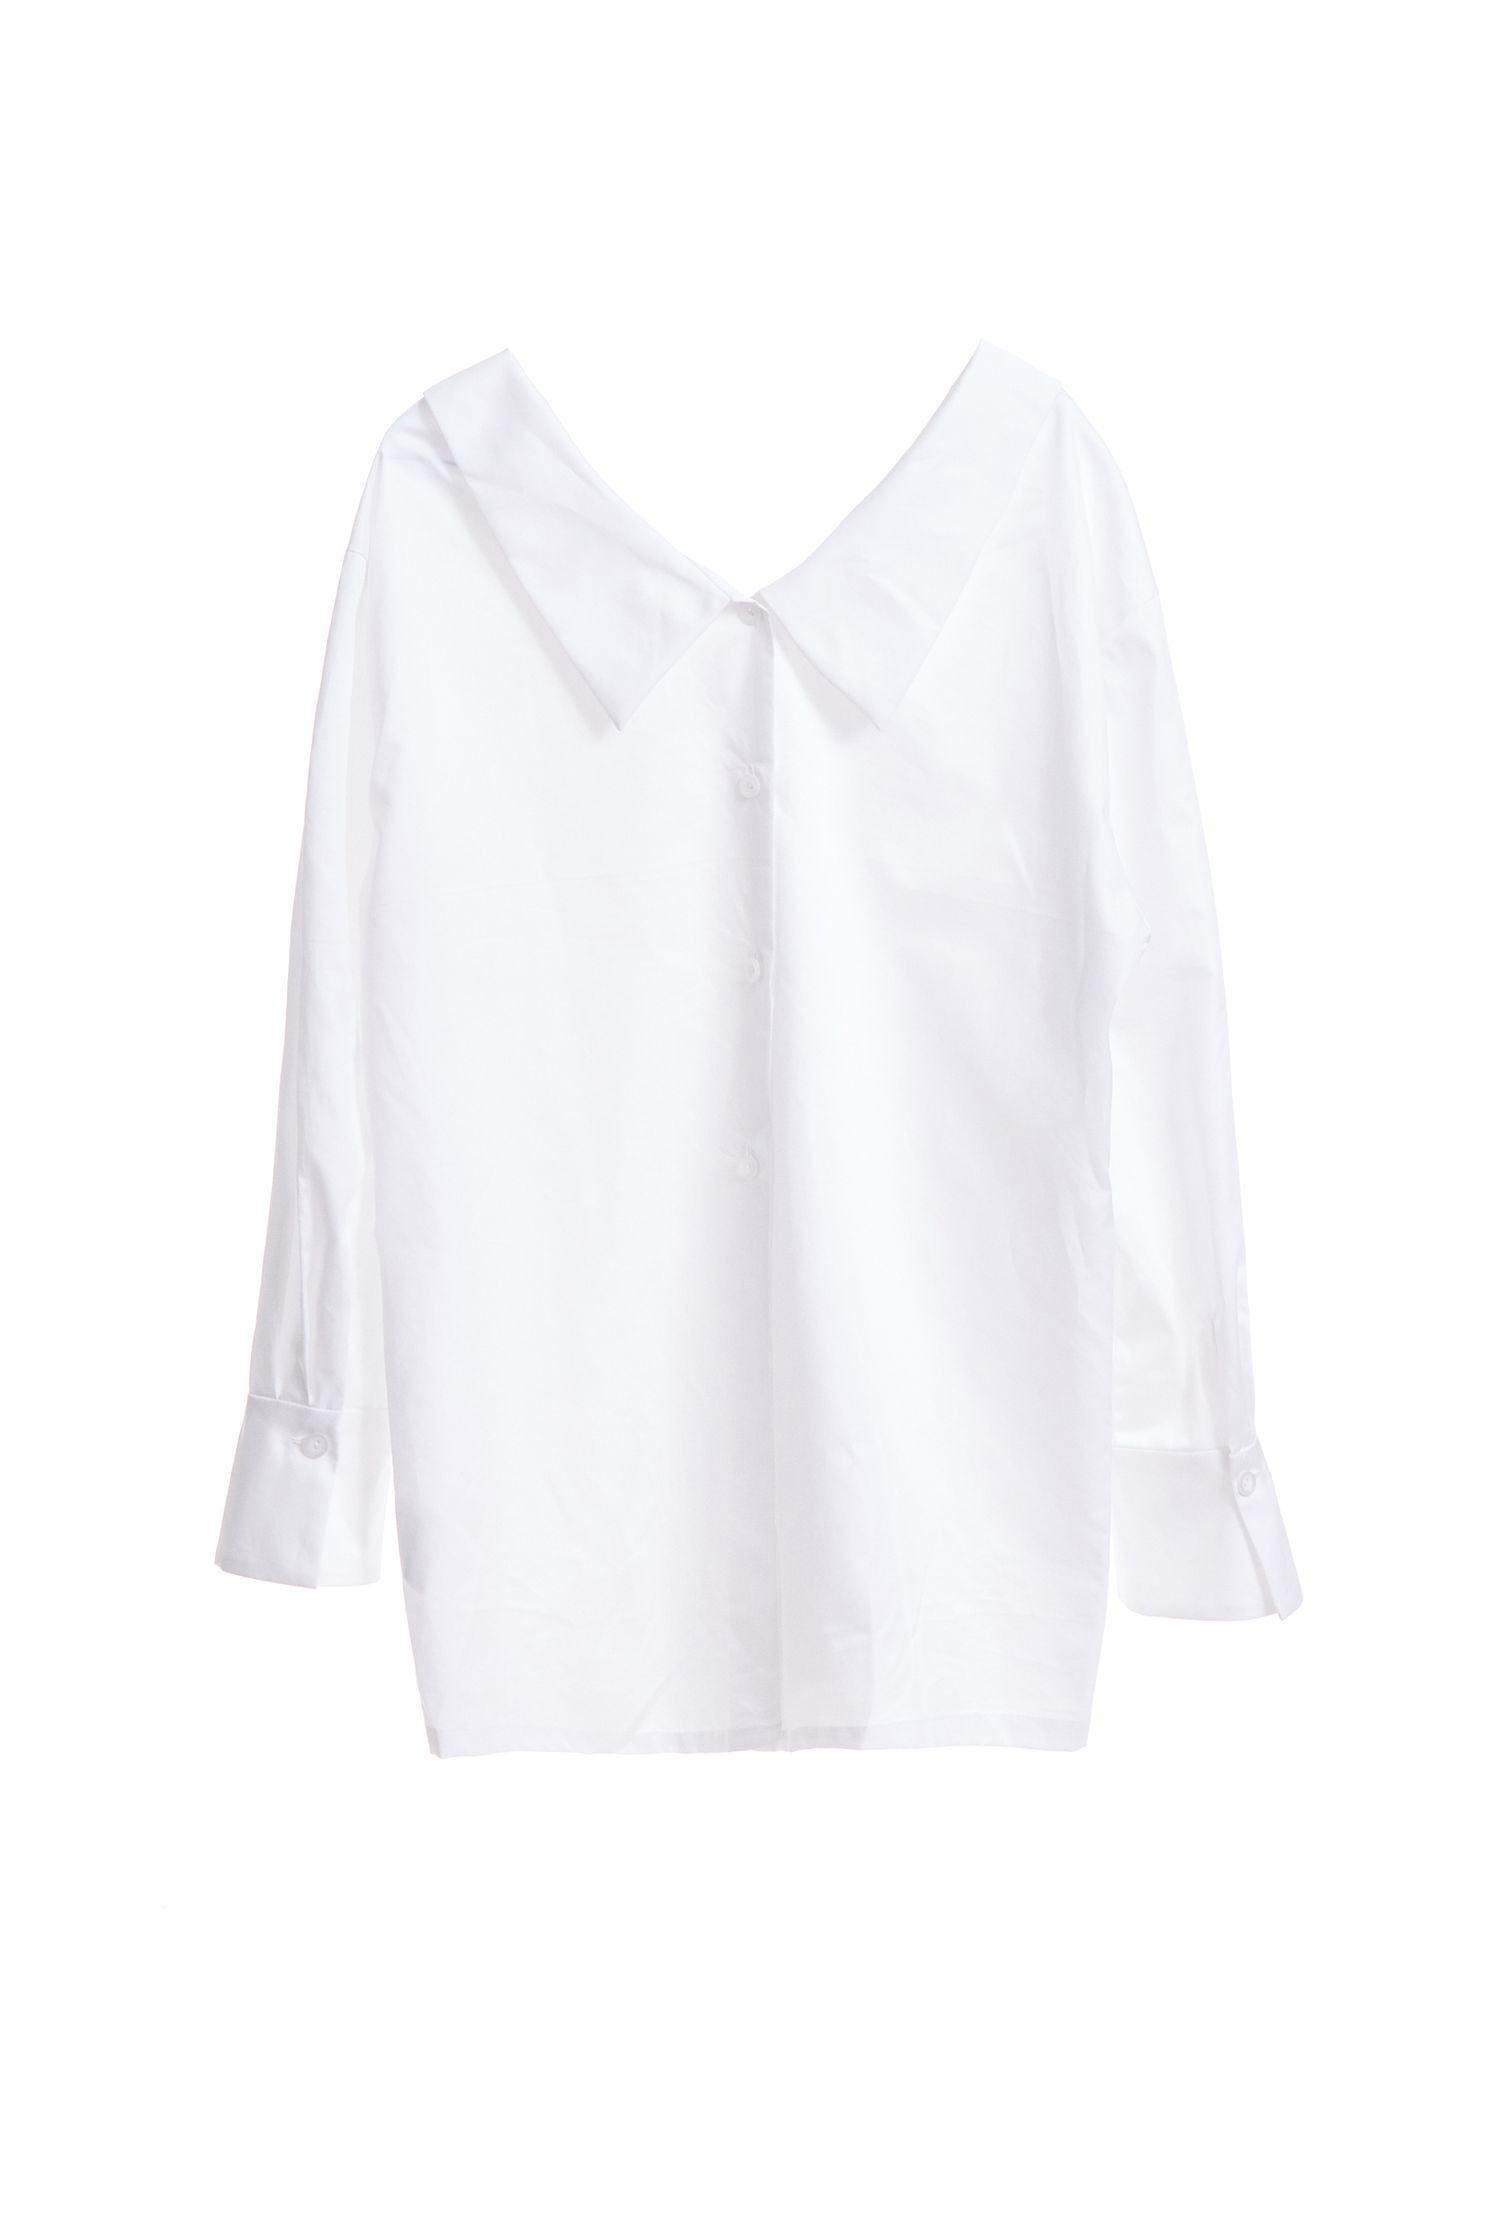 Off-shoulder shirts,whitetop,i-select,blouse,longsleevetop